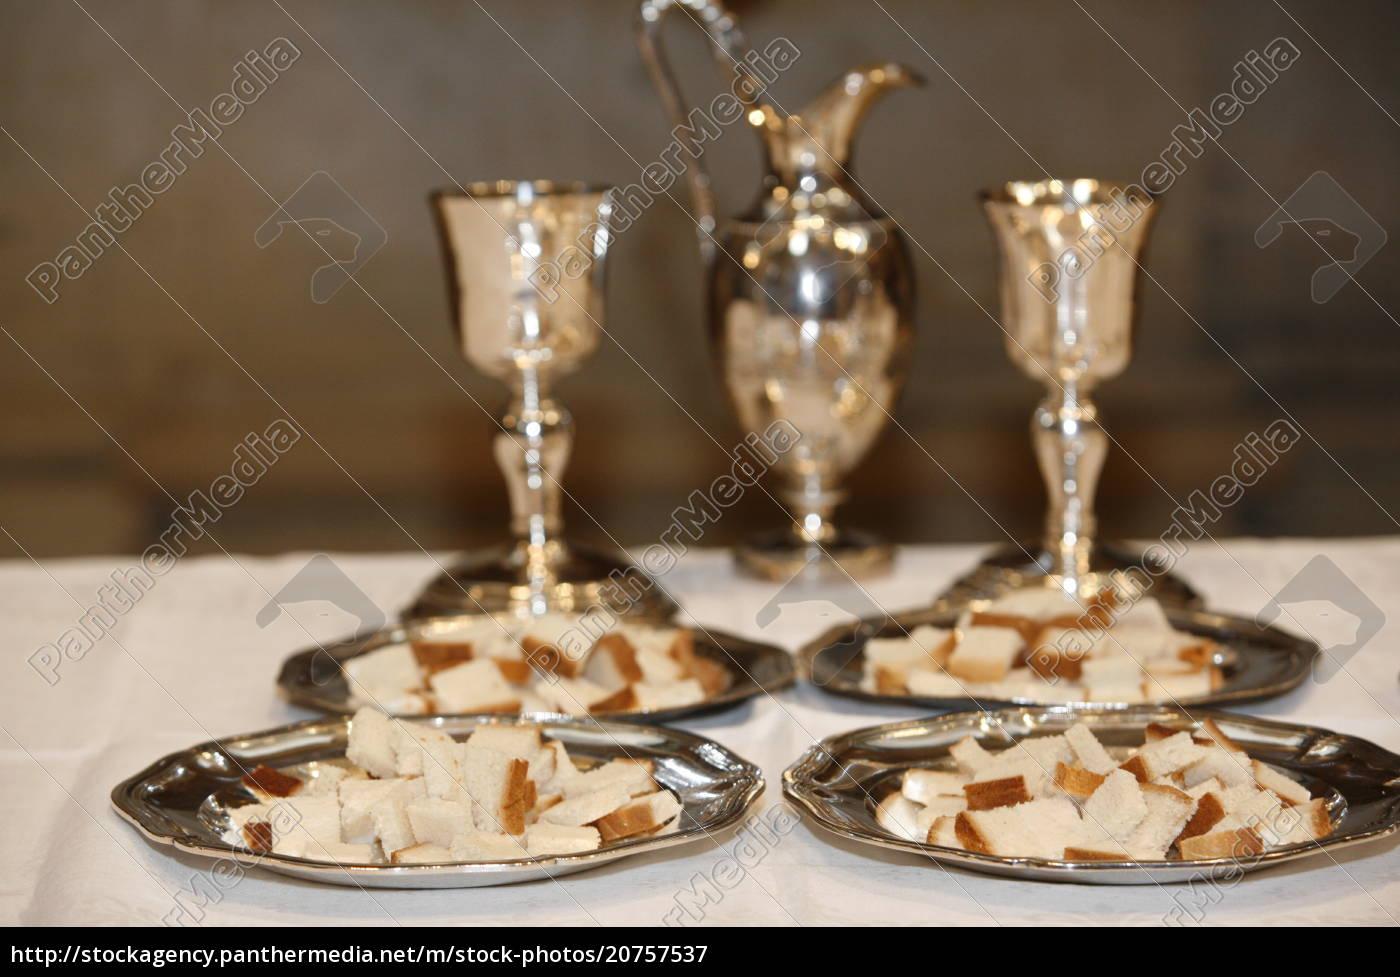 protestantische, eucharistie, paris, ile, de, france, frankreich, europa - 20757537